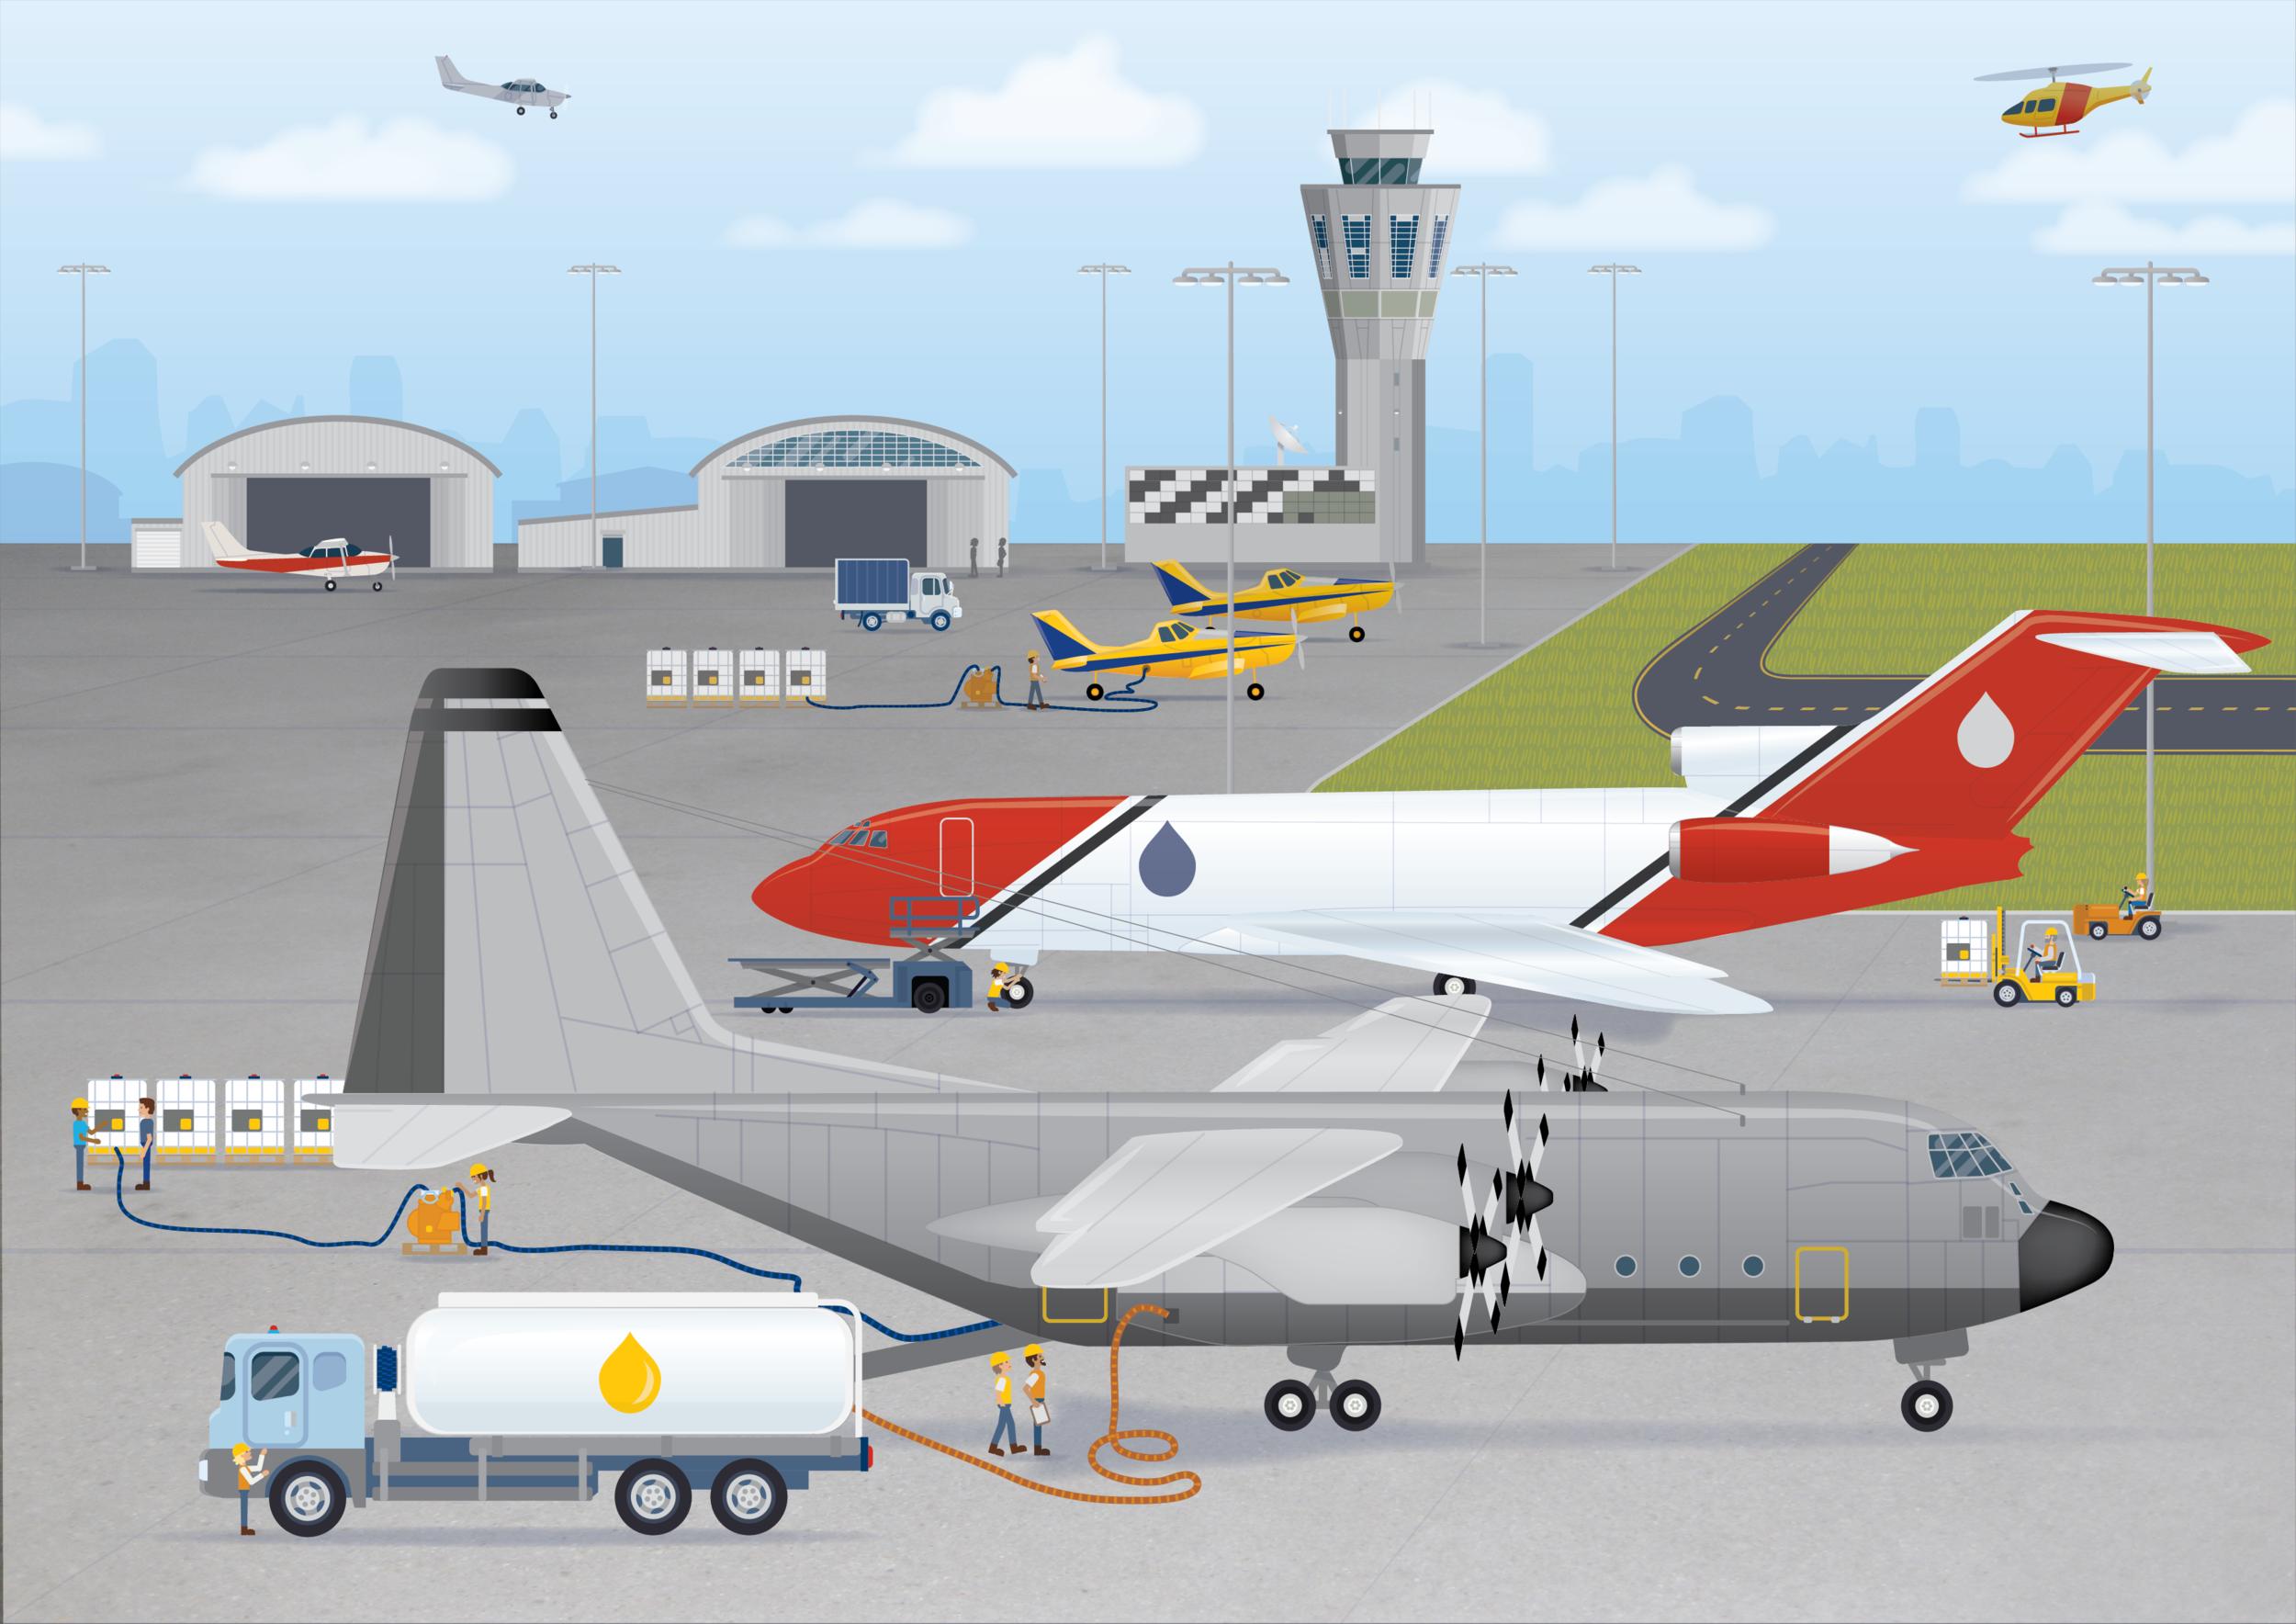 AMCS - Airport Illustration